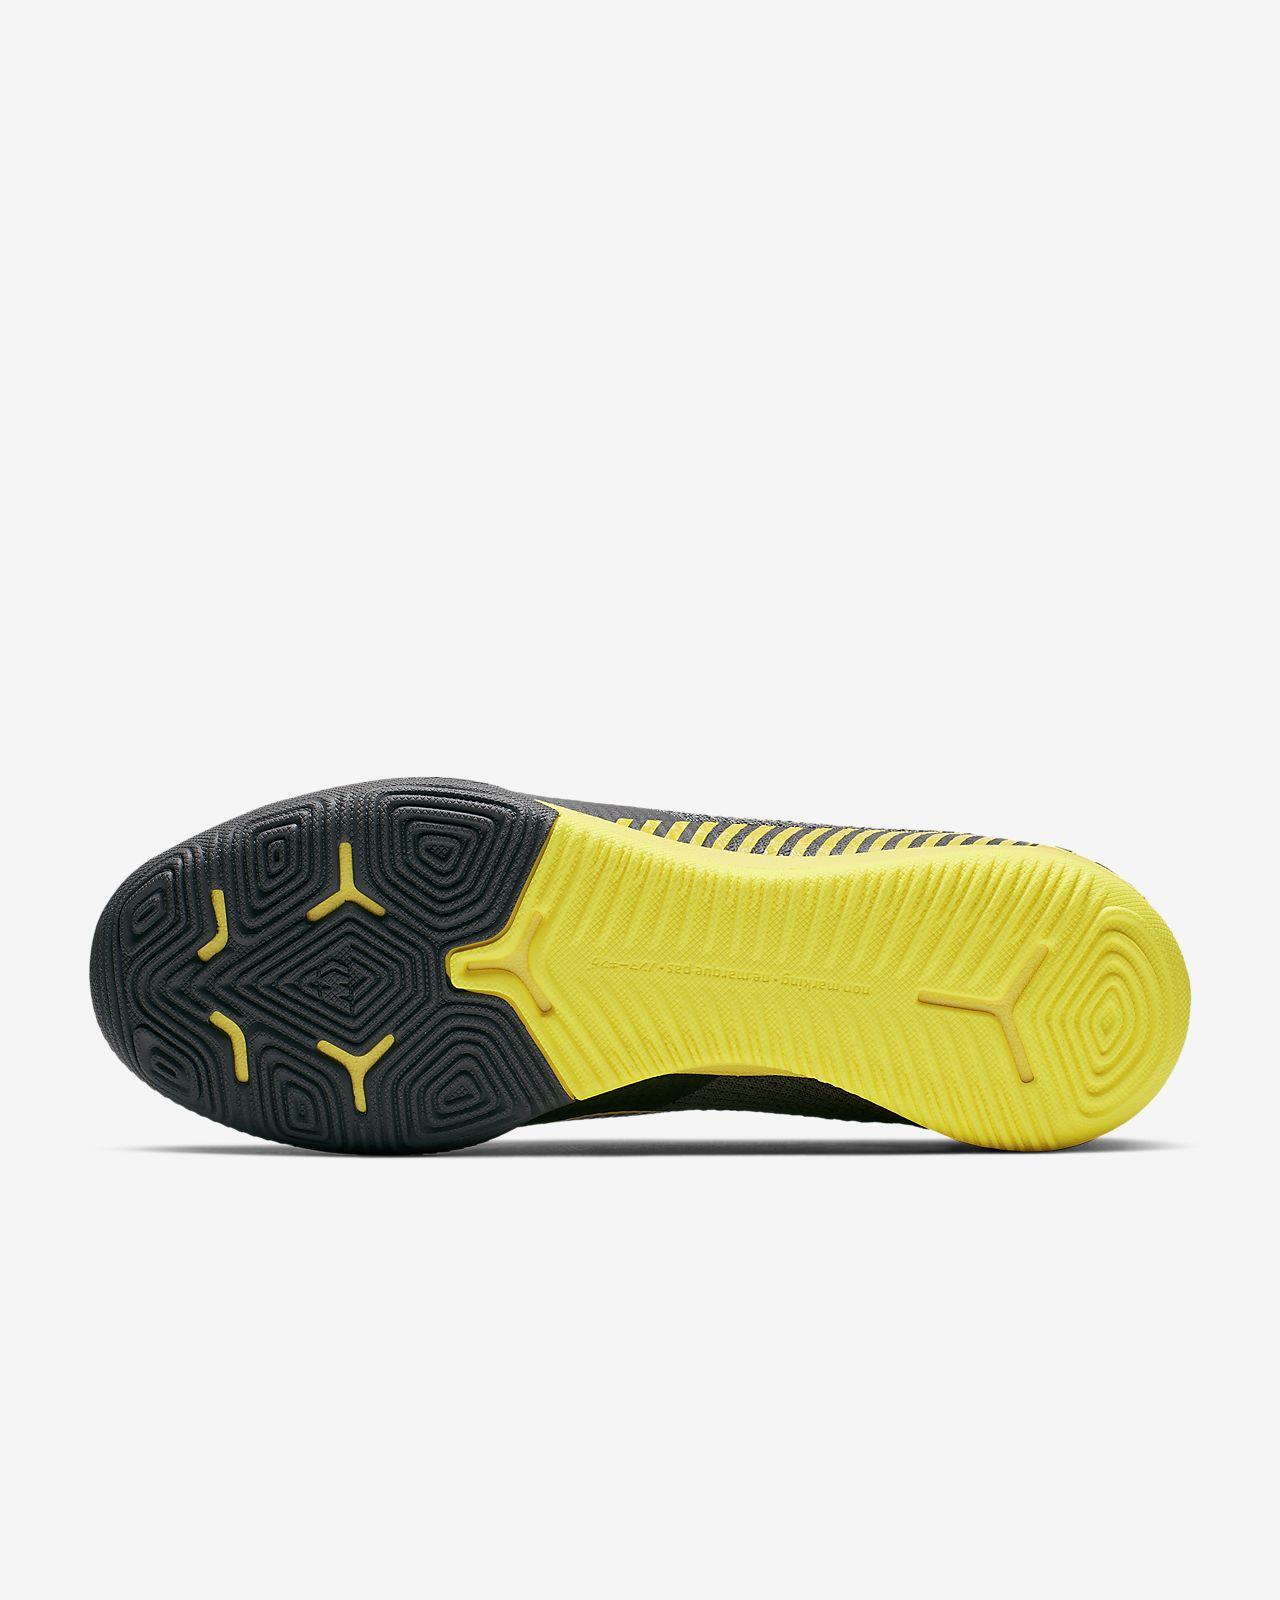 100% authentic 0dc48 521a6 ... Calzado de fútbol para cancha cubierta para hombre Nike SuperflyX 6  Elite IC Game Over